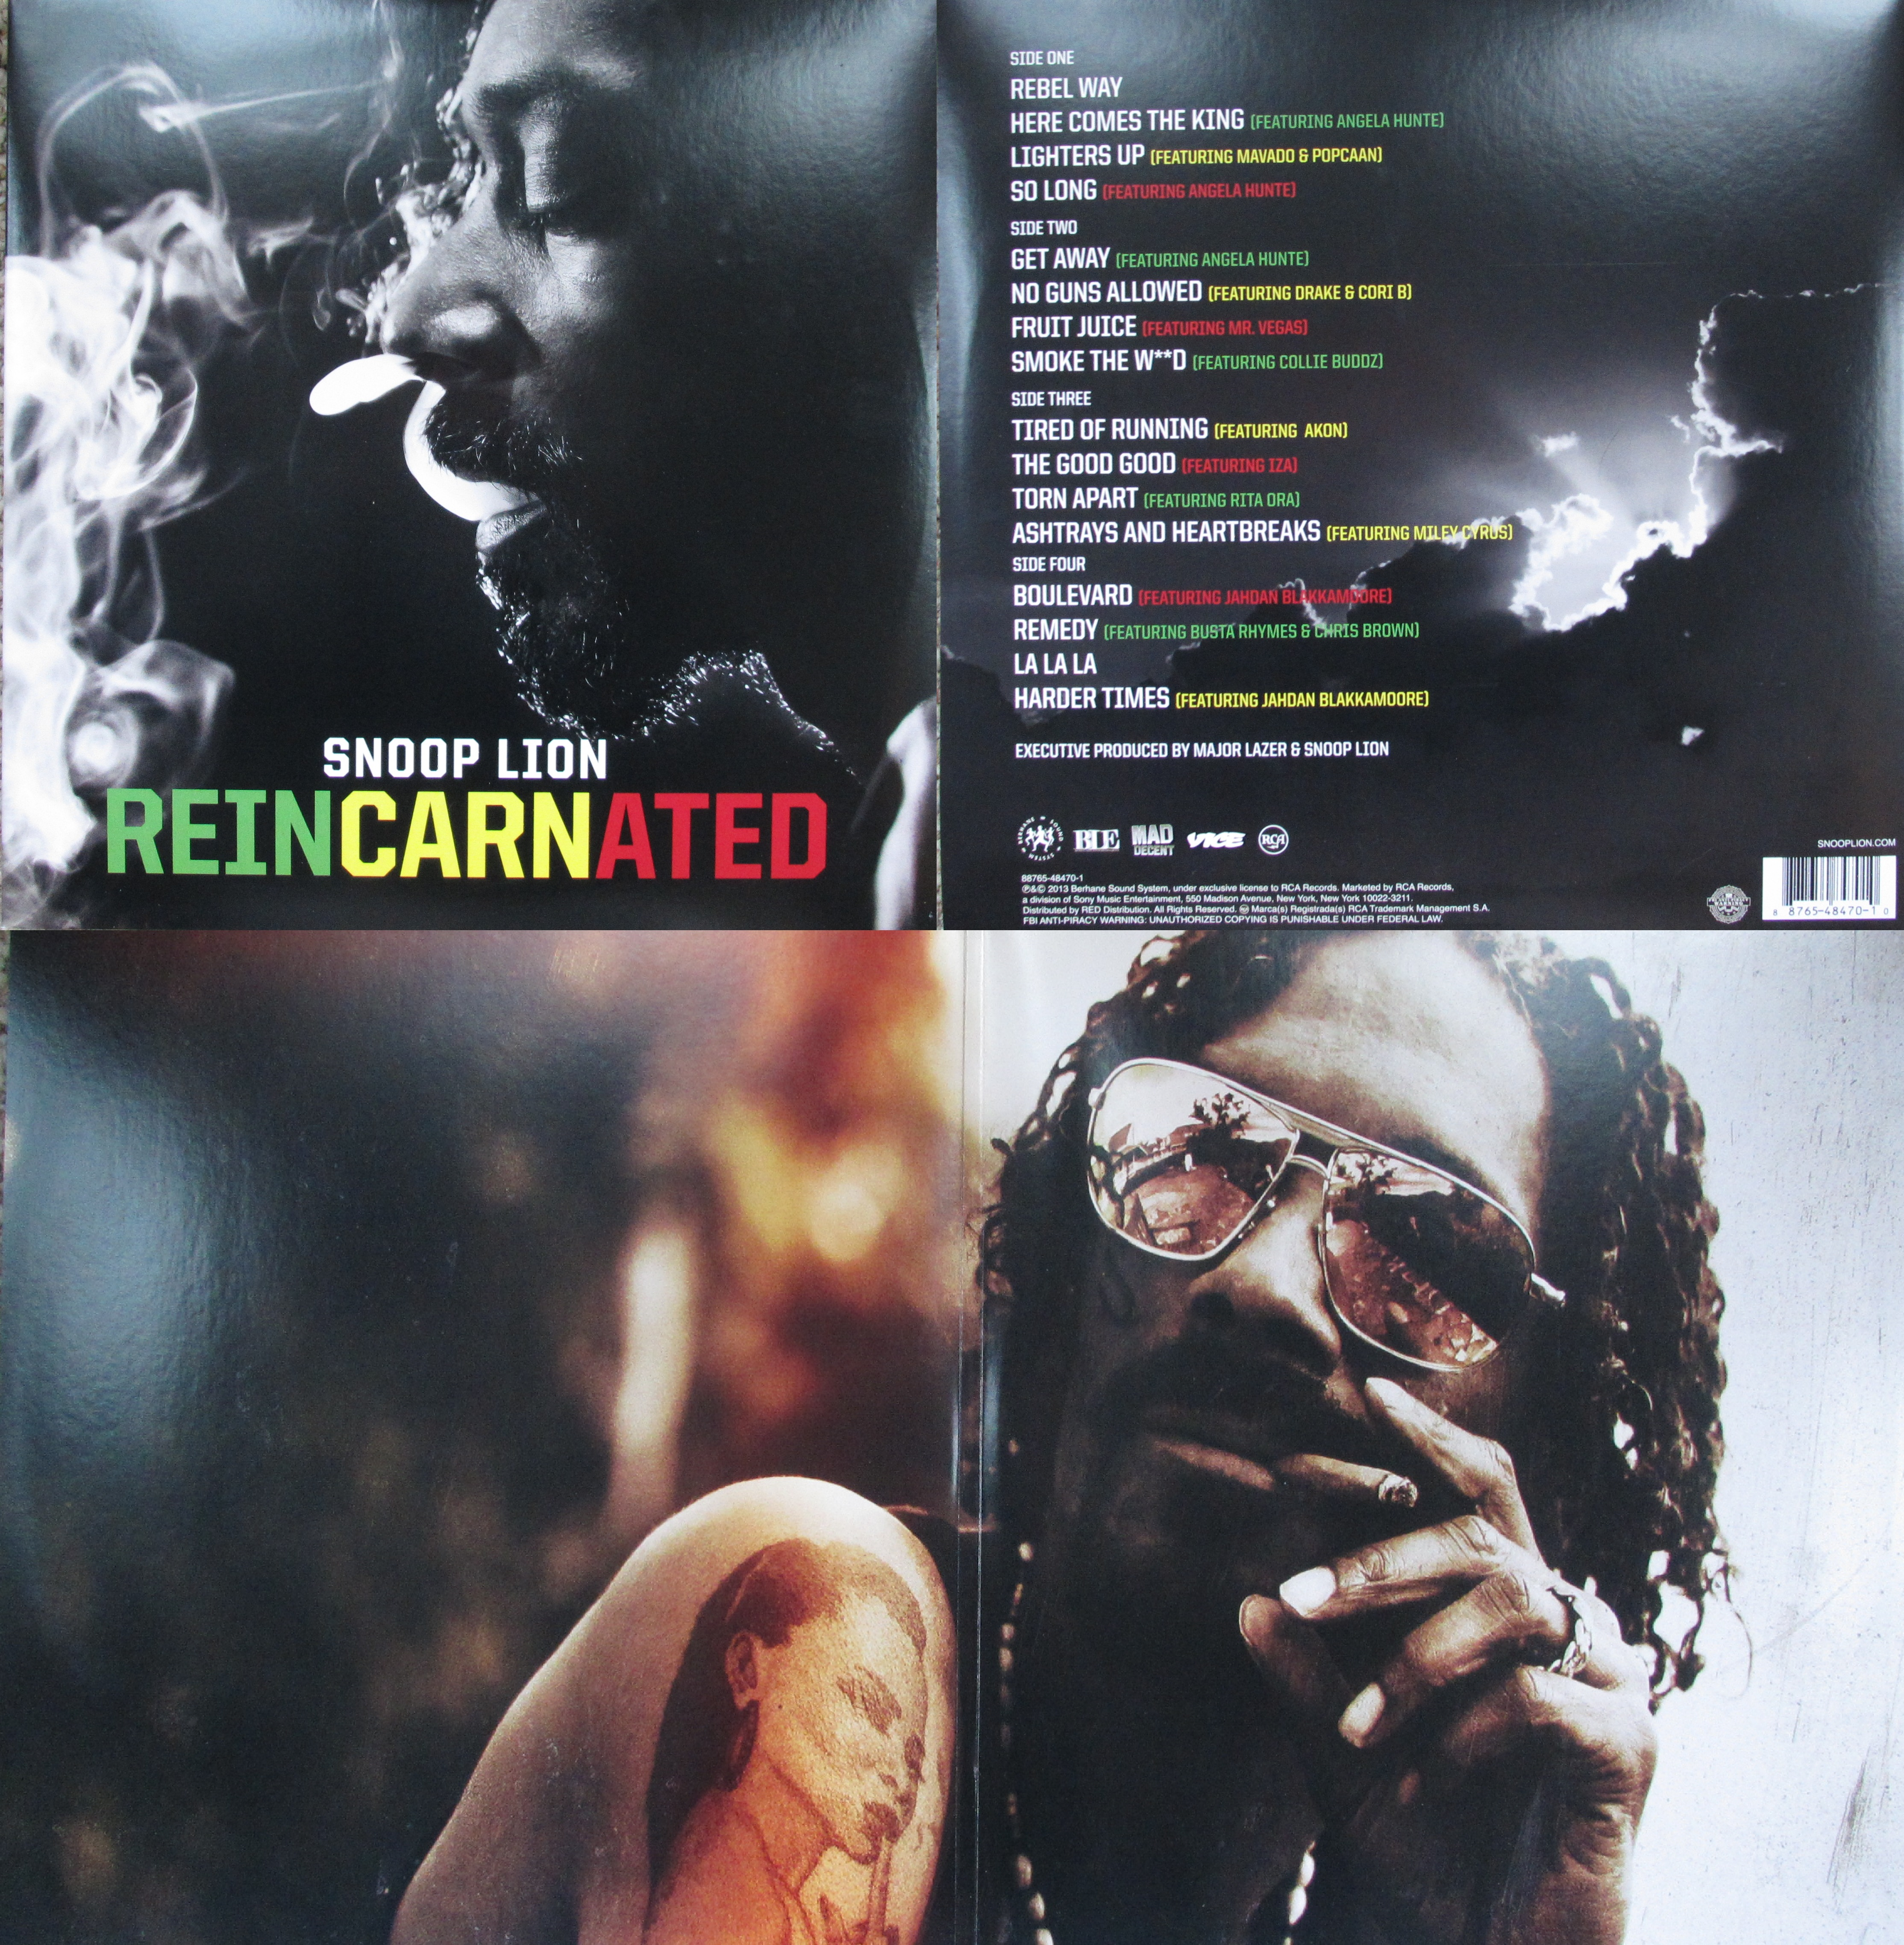 Tired of Running feat Akon Snoop Lion Lyrics